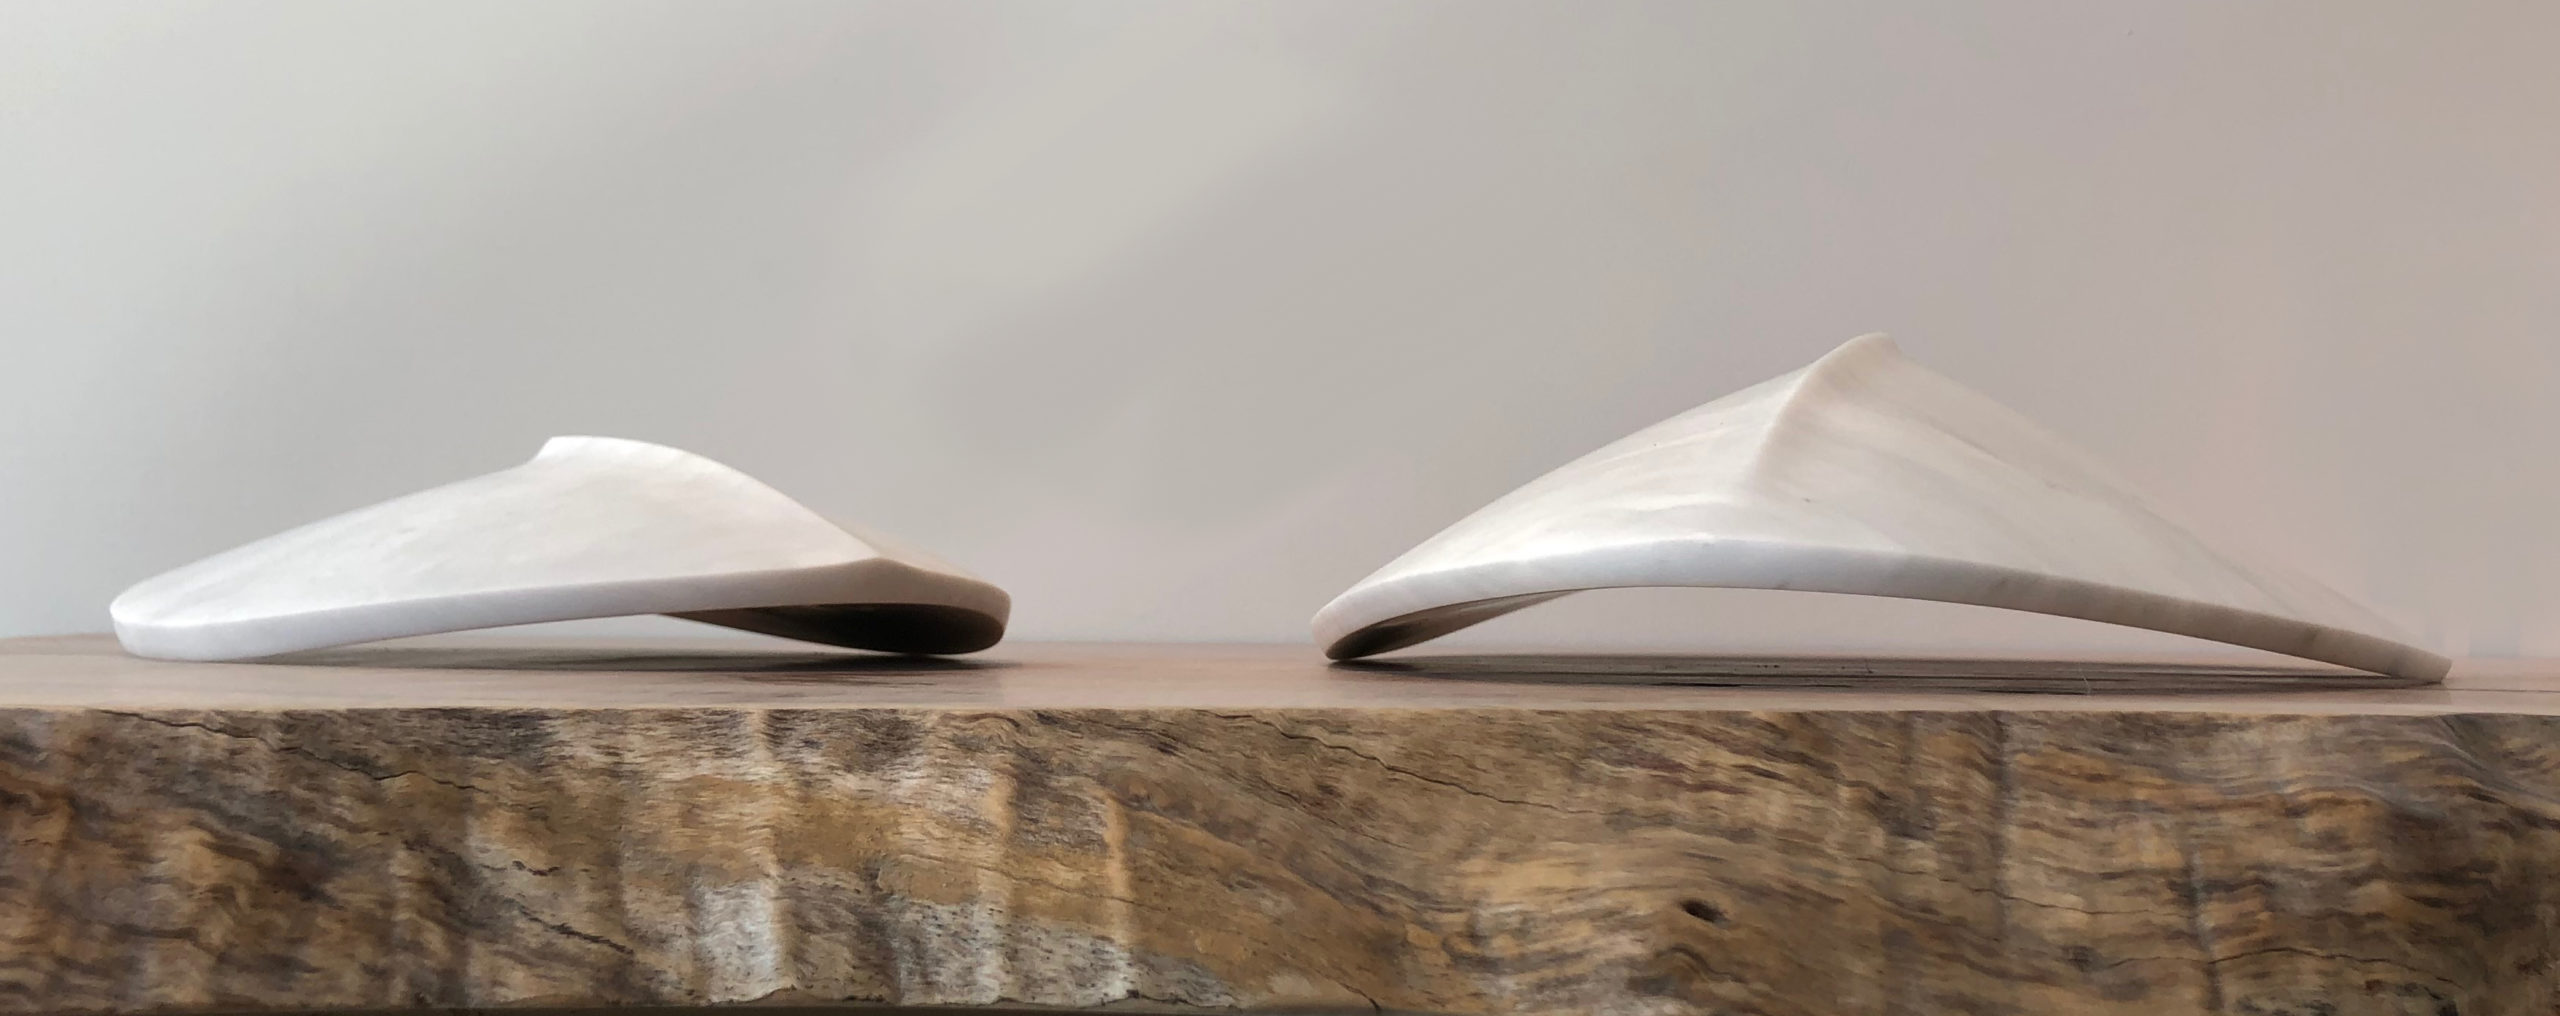 michael binkley sculptor stone sculpture abstract alien ship fine art carrara marble vancouver canada